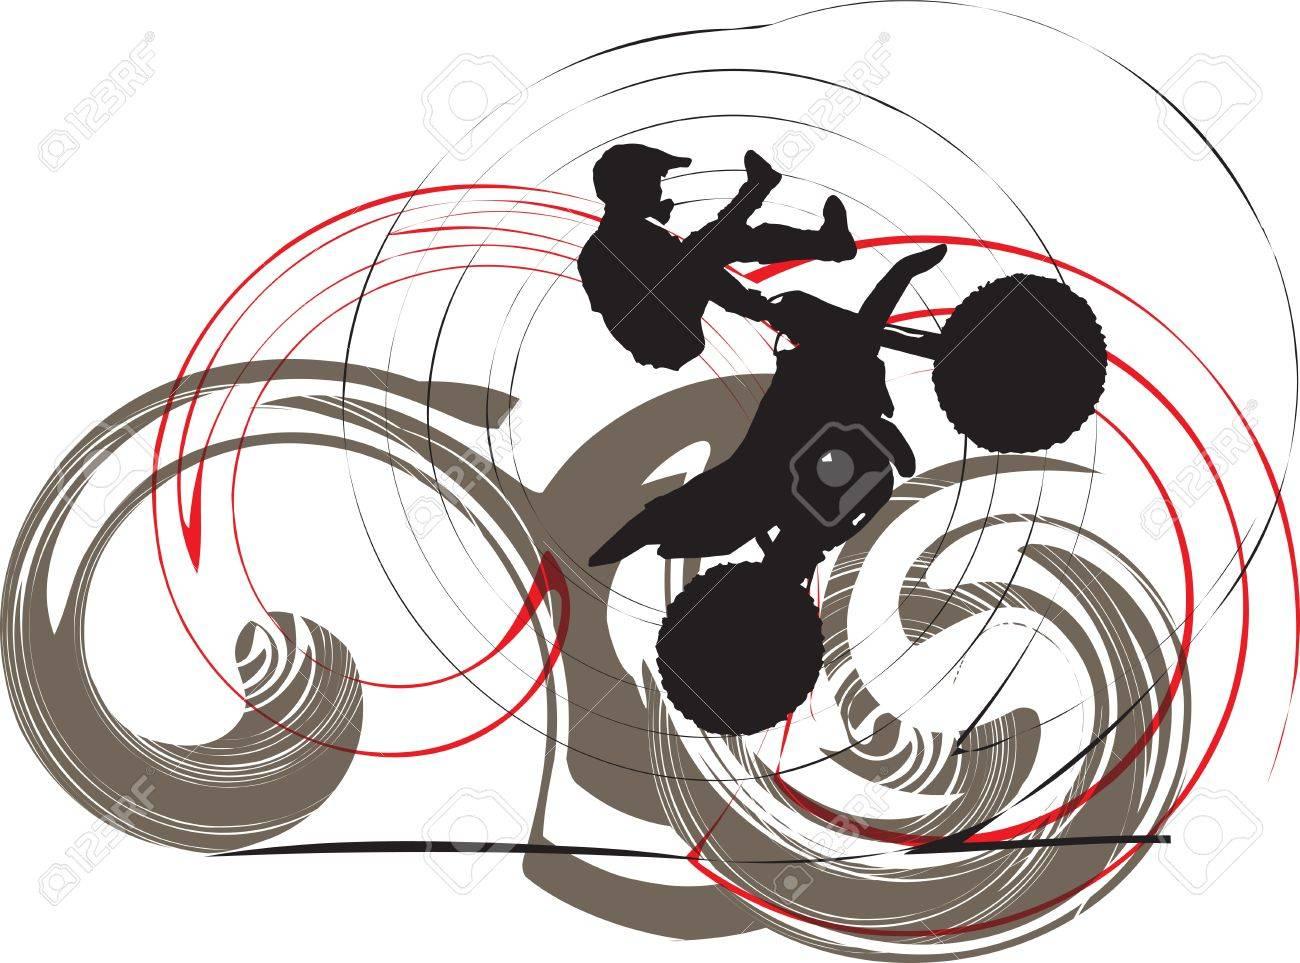 Biker illustration Stock Vector - 10937064